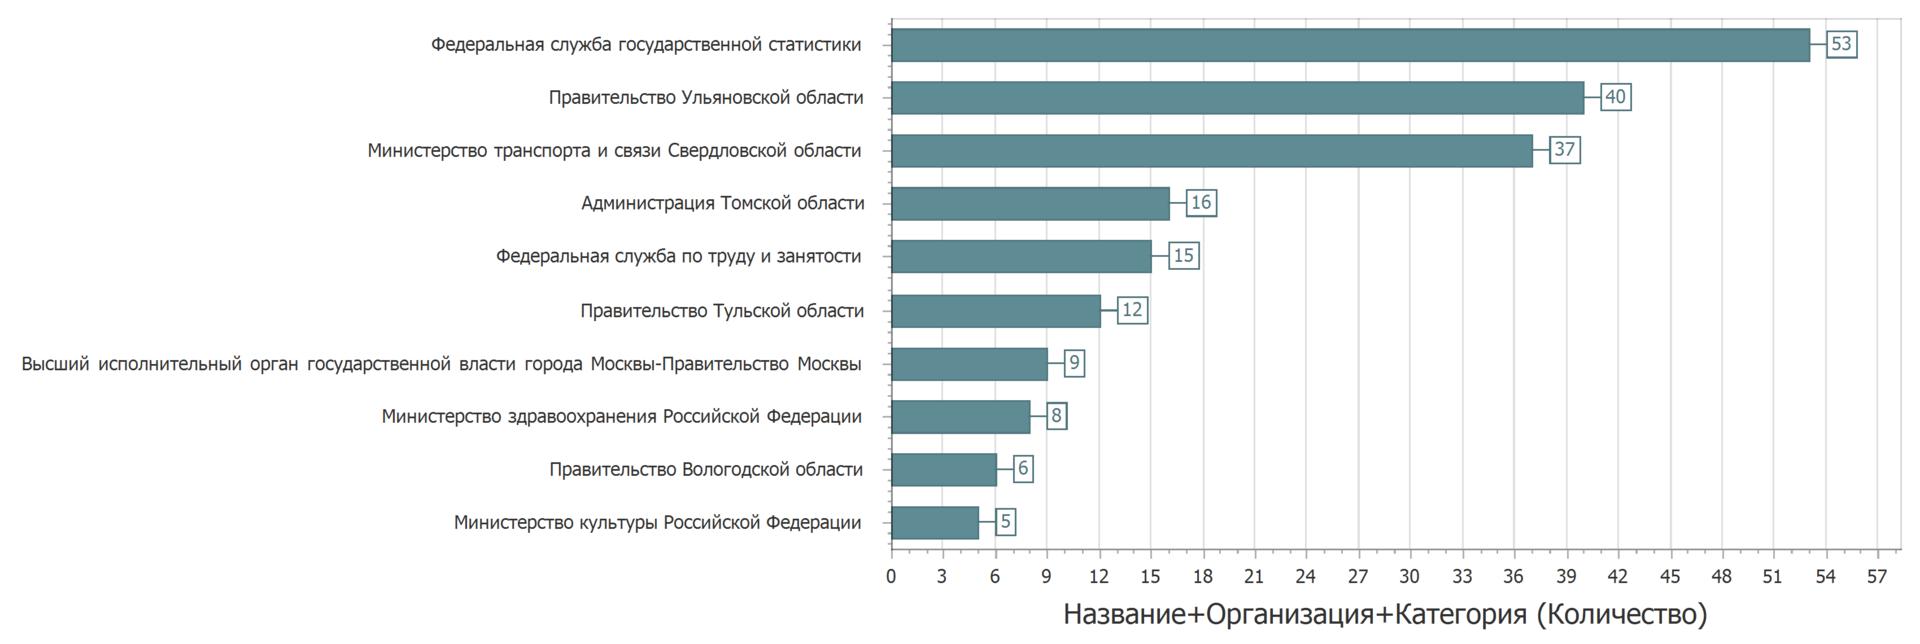 Анализ наборов данных с портала открытых данных data.gov.ru - 7